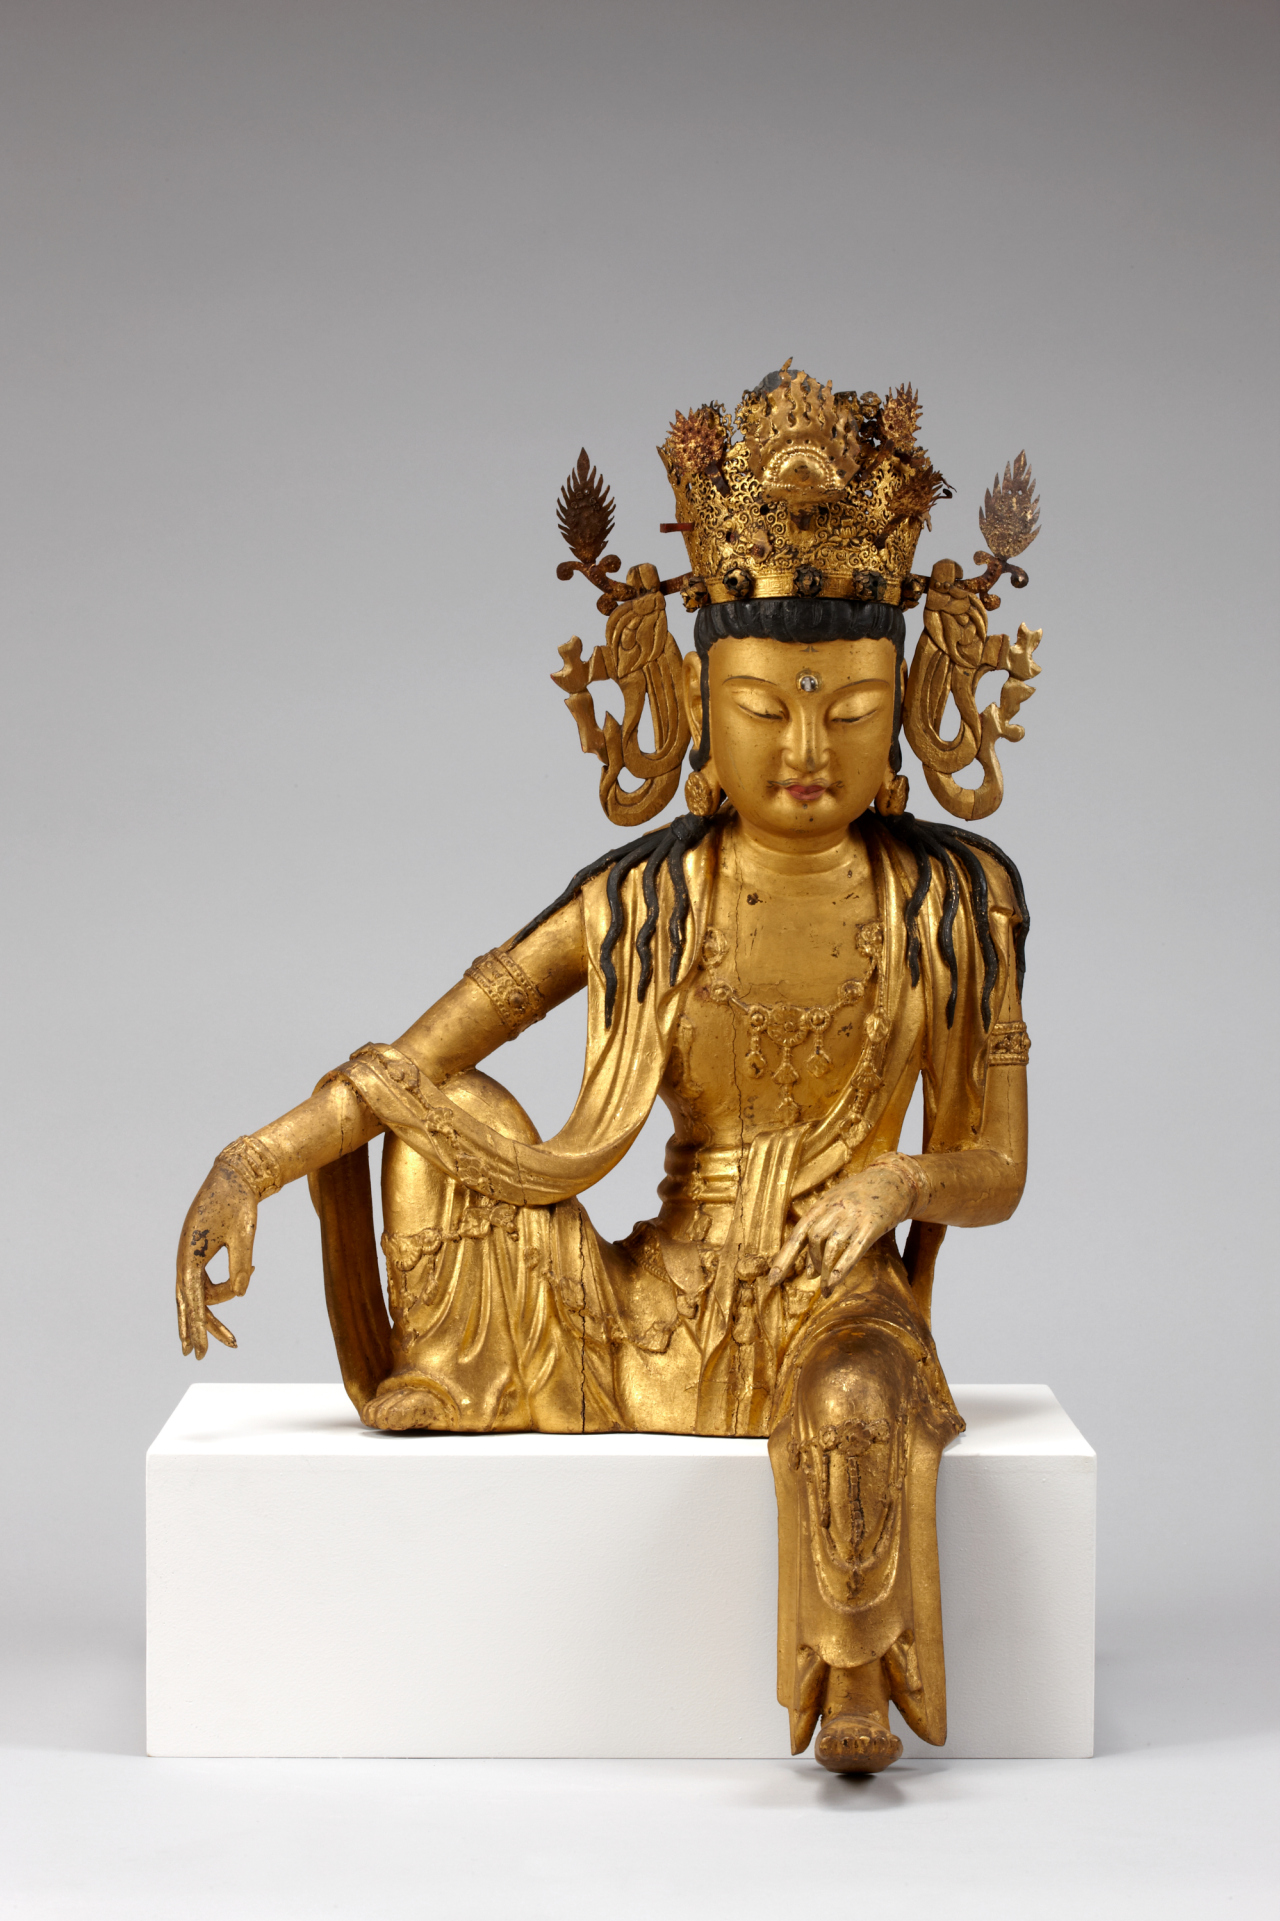 Seated wooden Avalokiteshvara, Goryeo Kingdom, 13th century (National Museum of Korea)